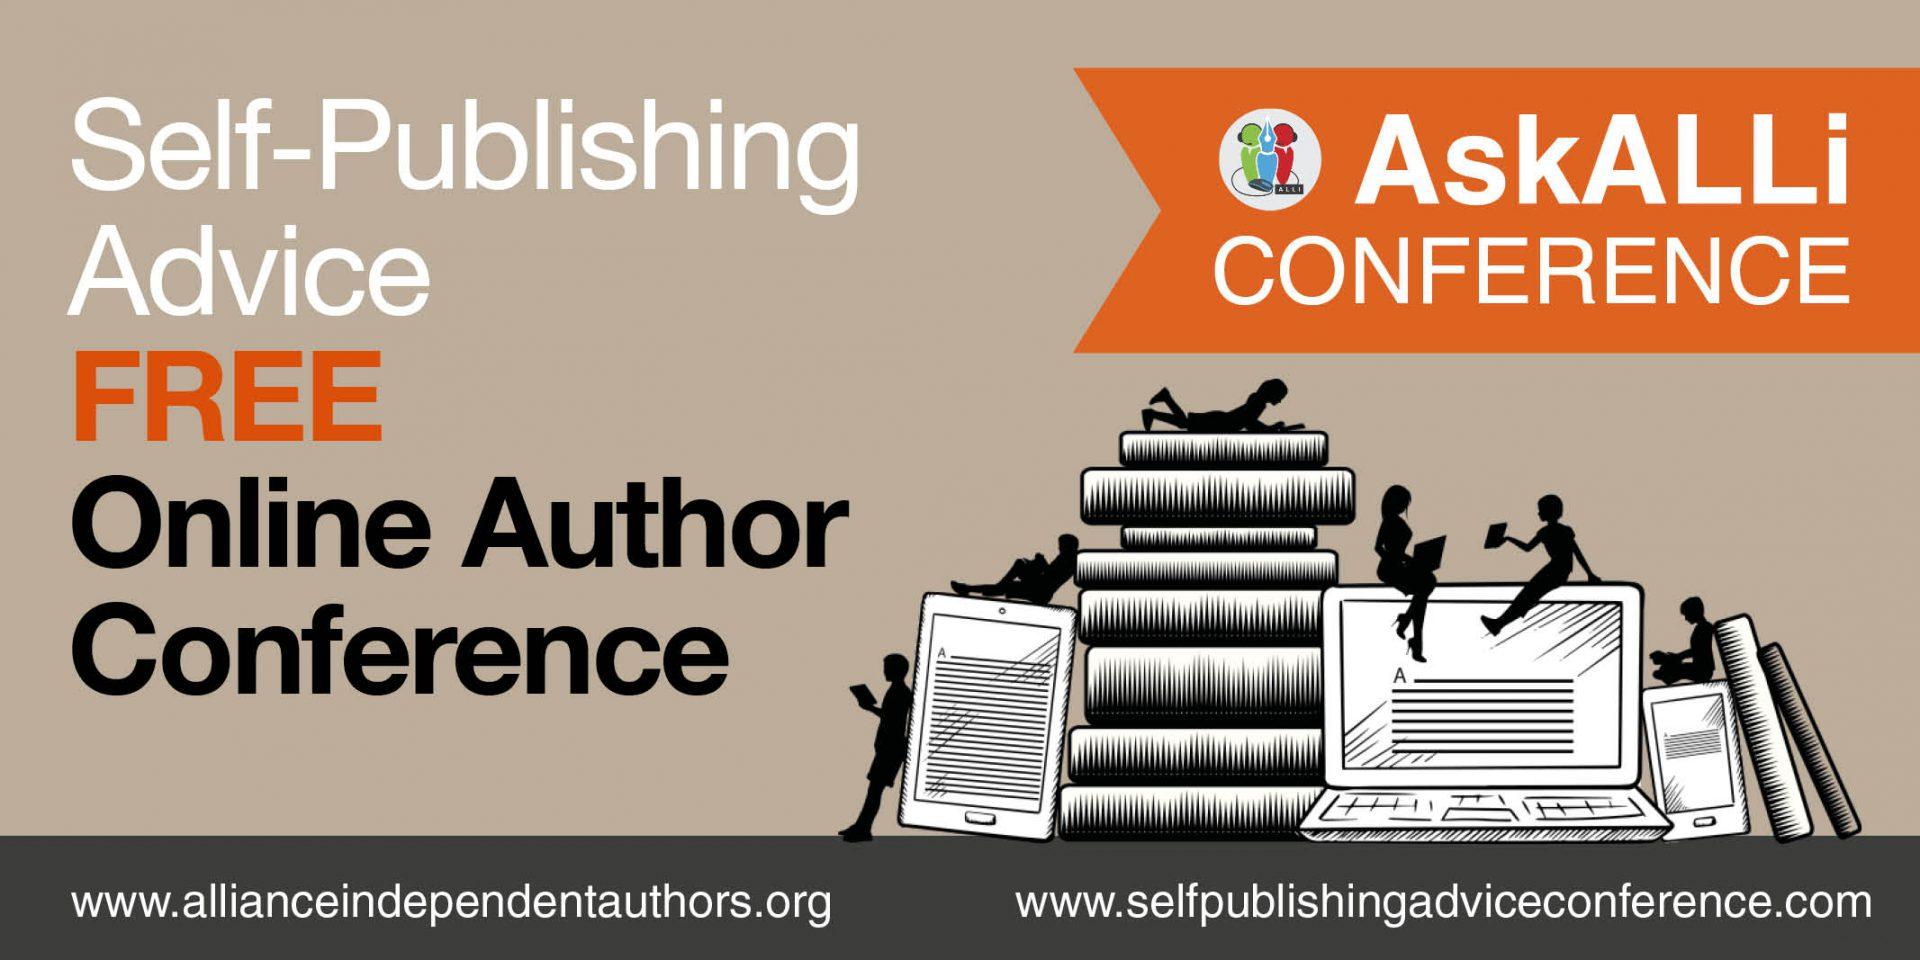 self-publishing advice conference